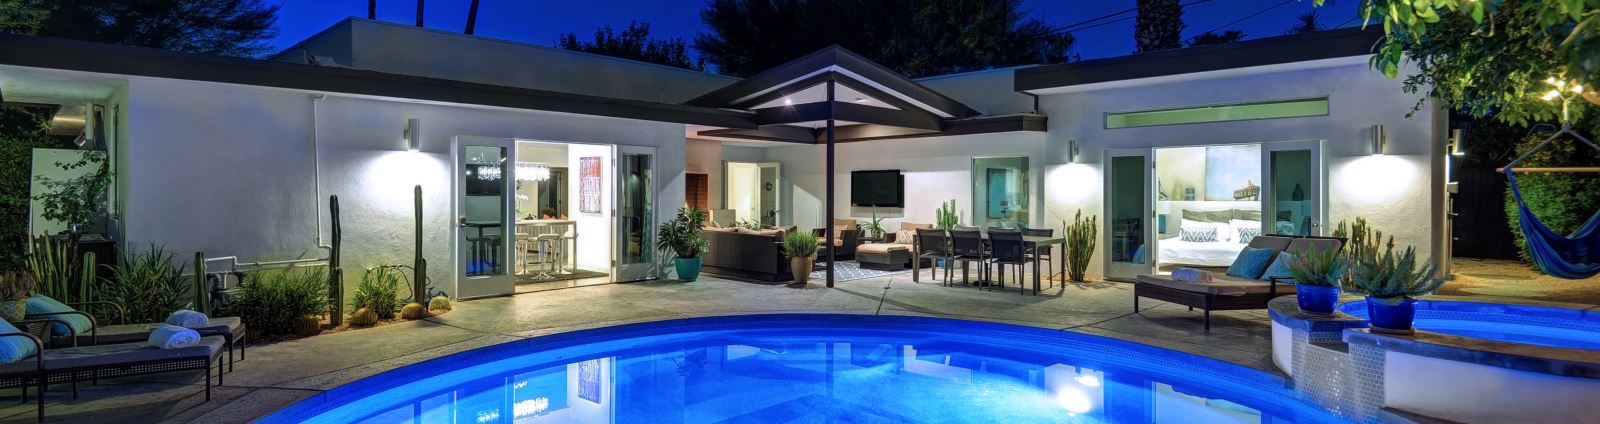 Palm Springs vacation rental pool